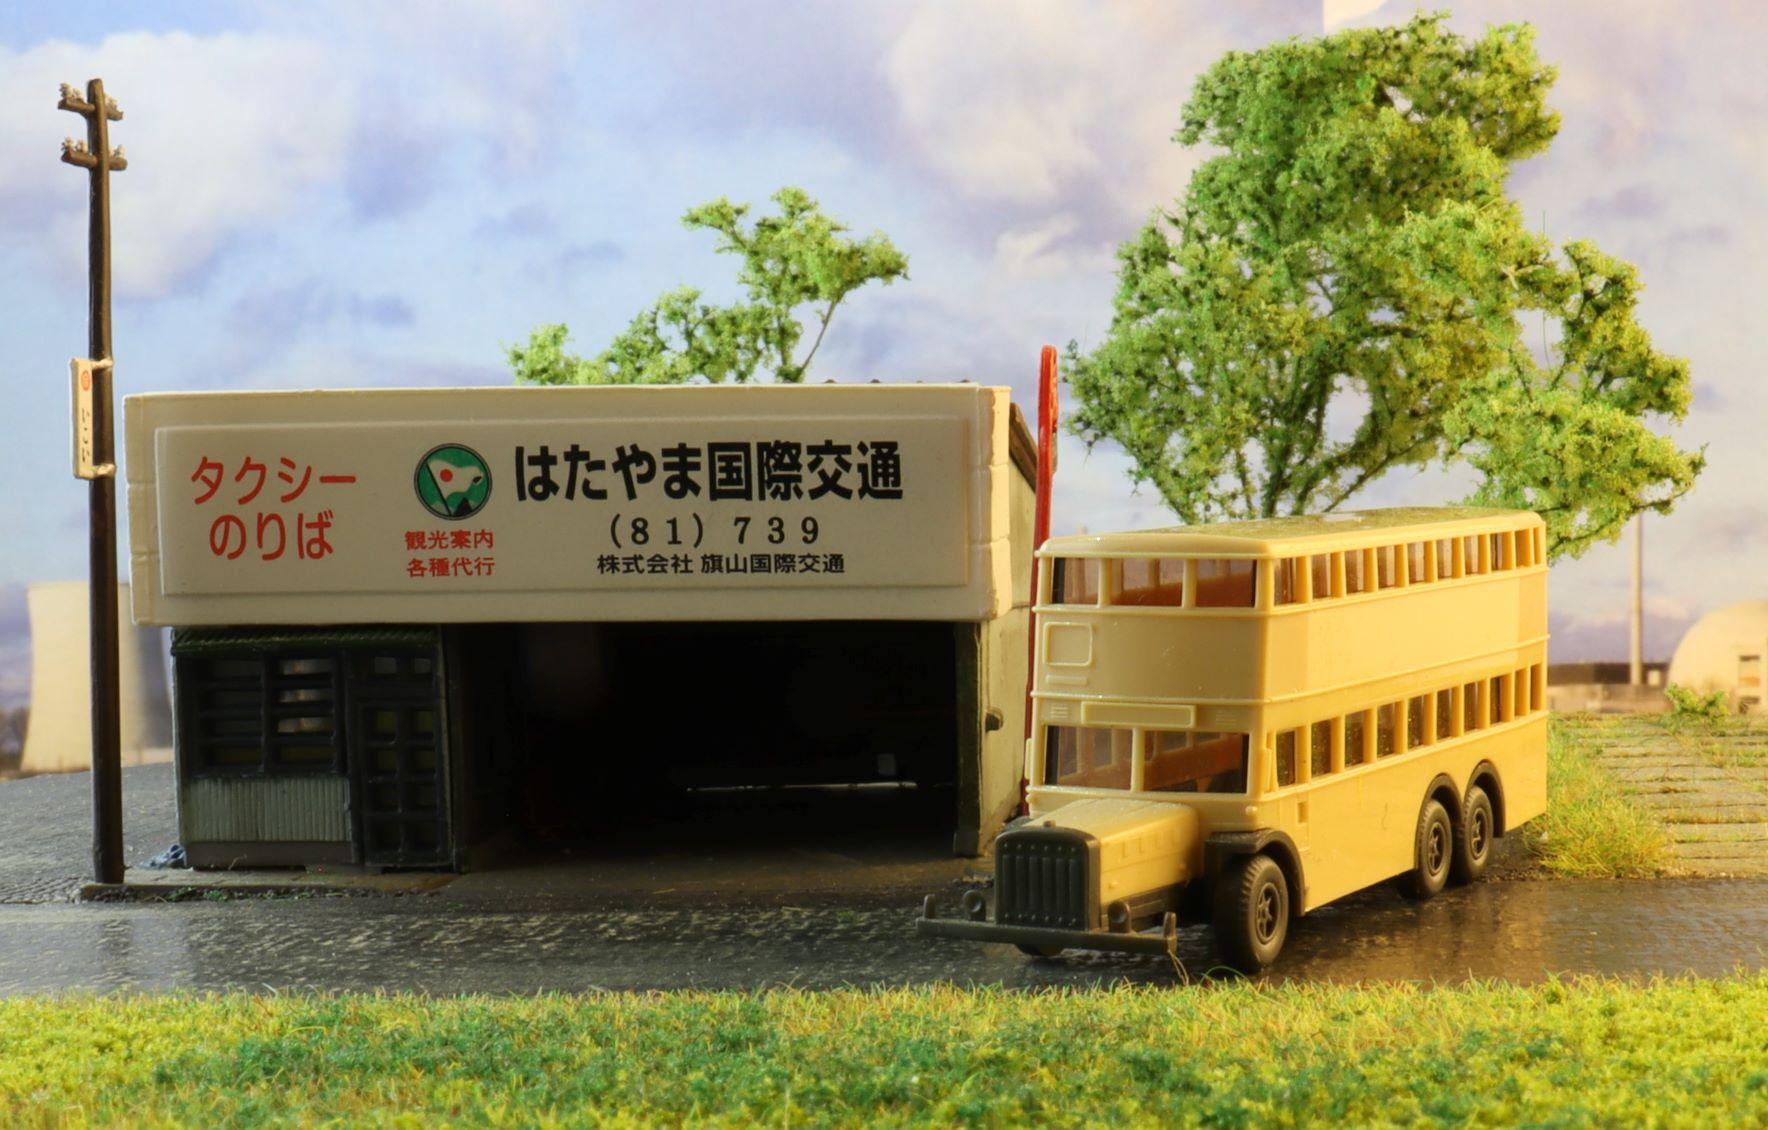 Bussing Autobus 3 .JPG